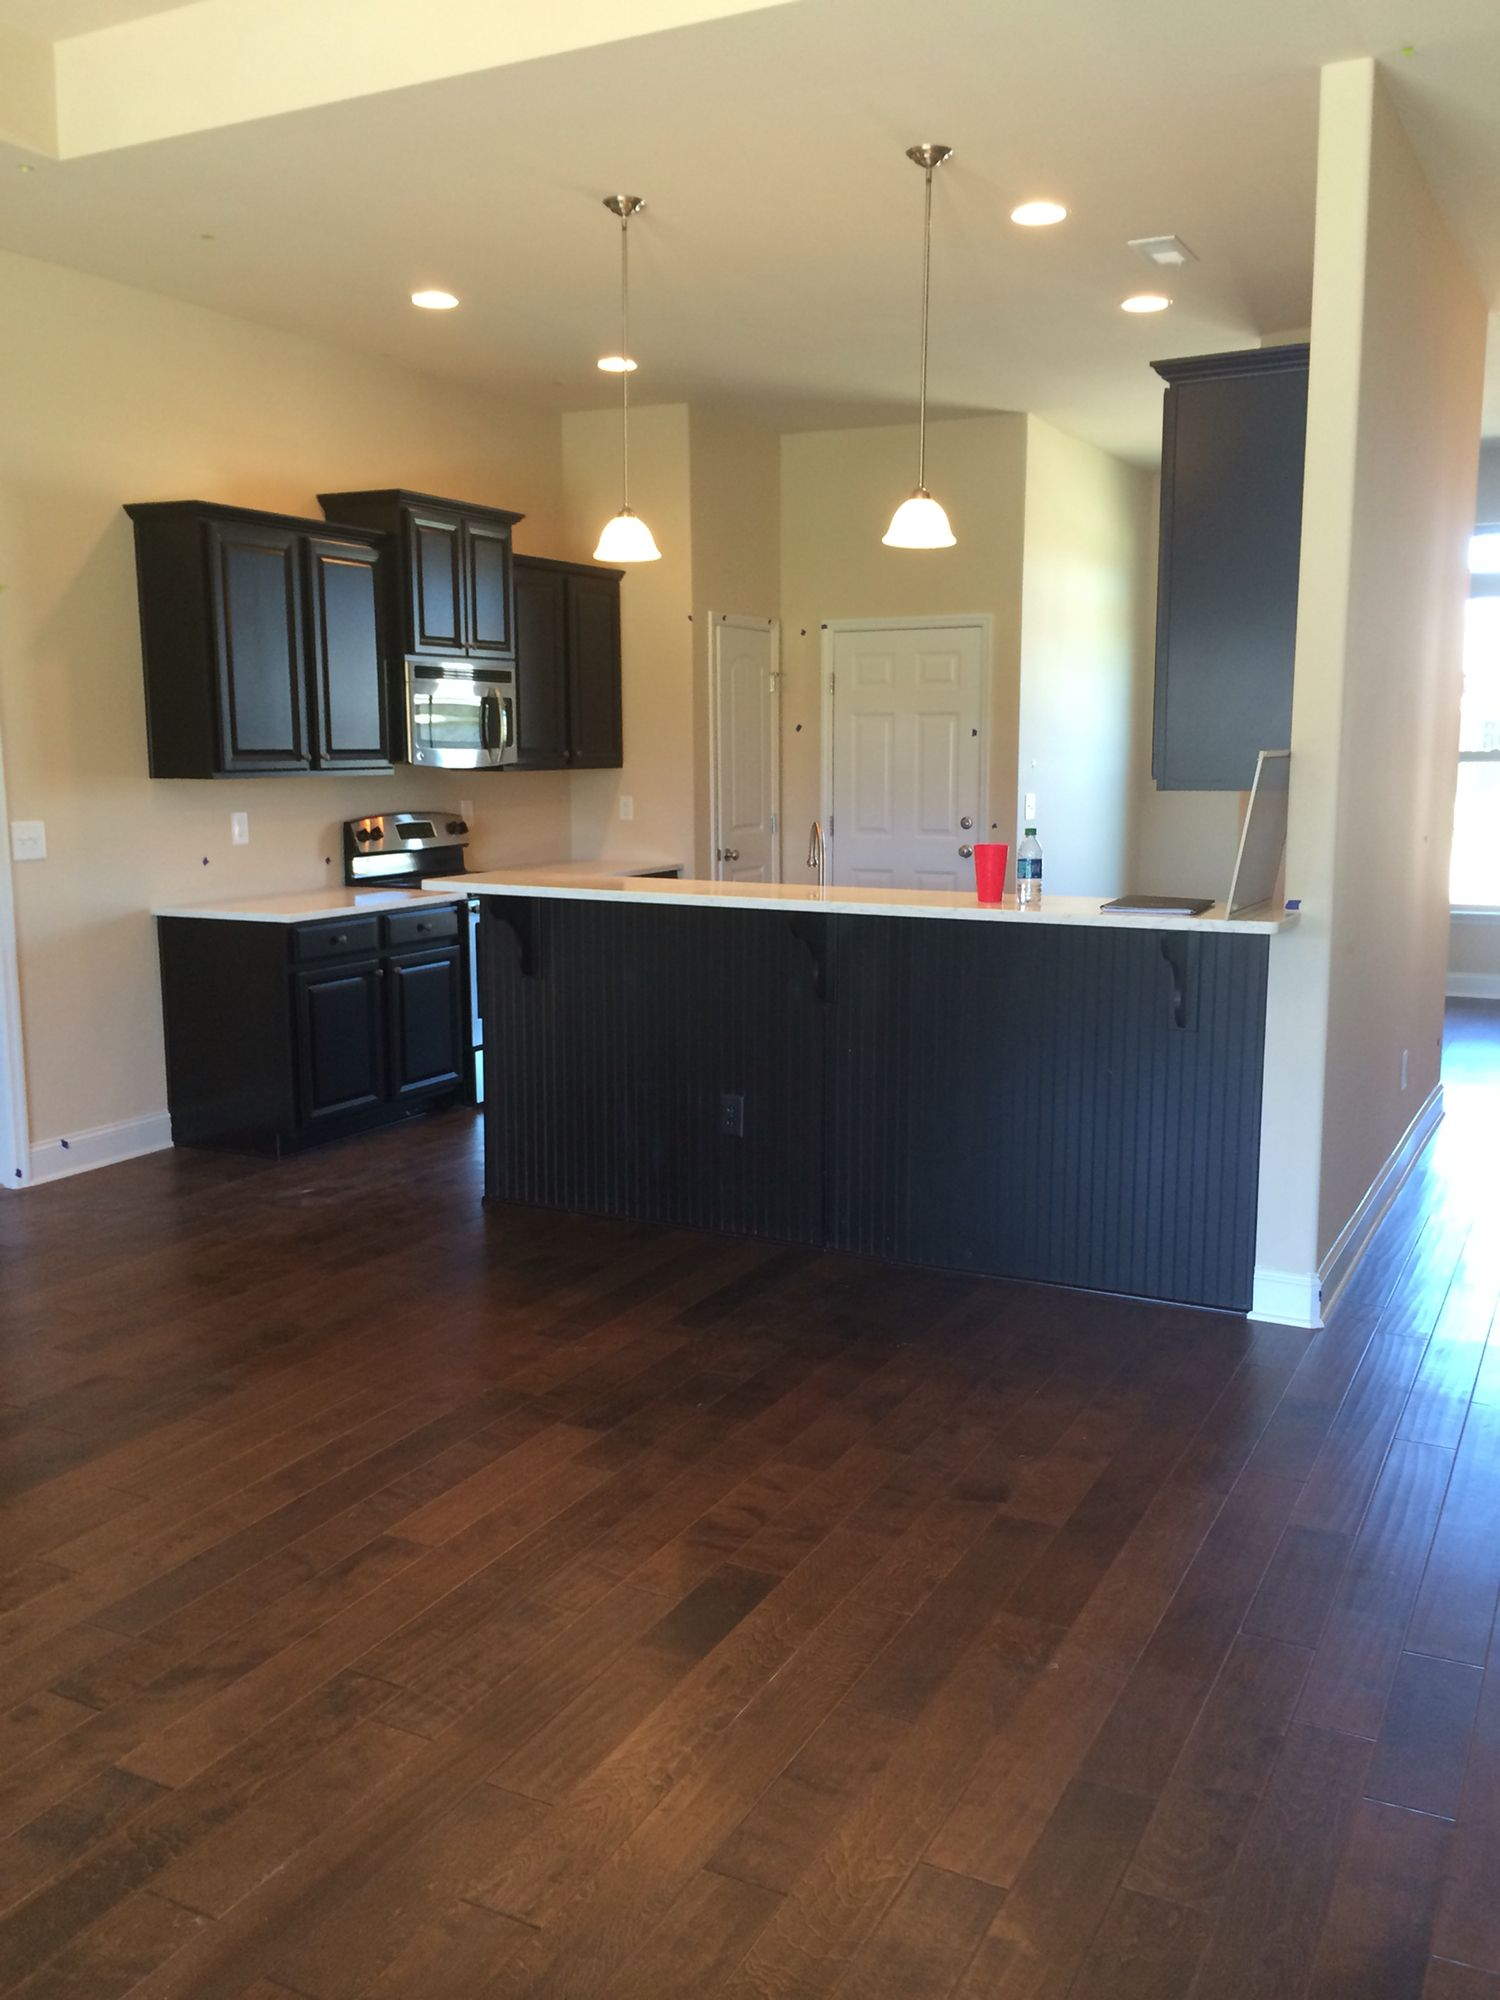 shaw biscayne bay surfside hardwood floors lg viatera minuet quartz counters